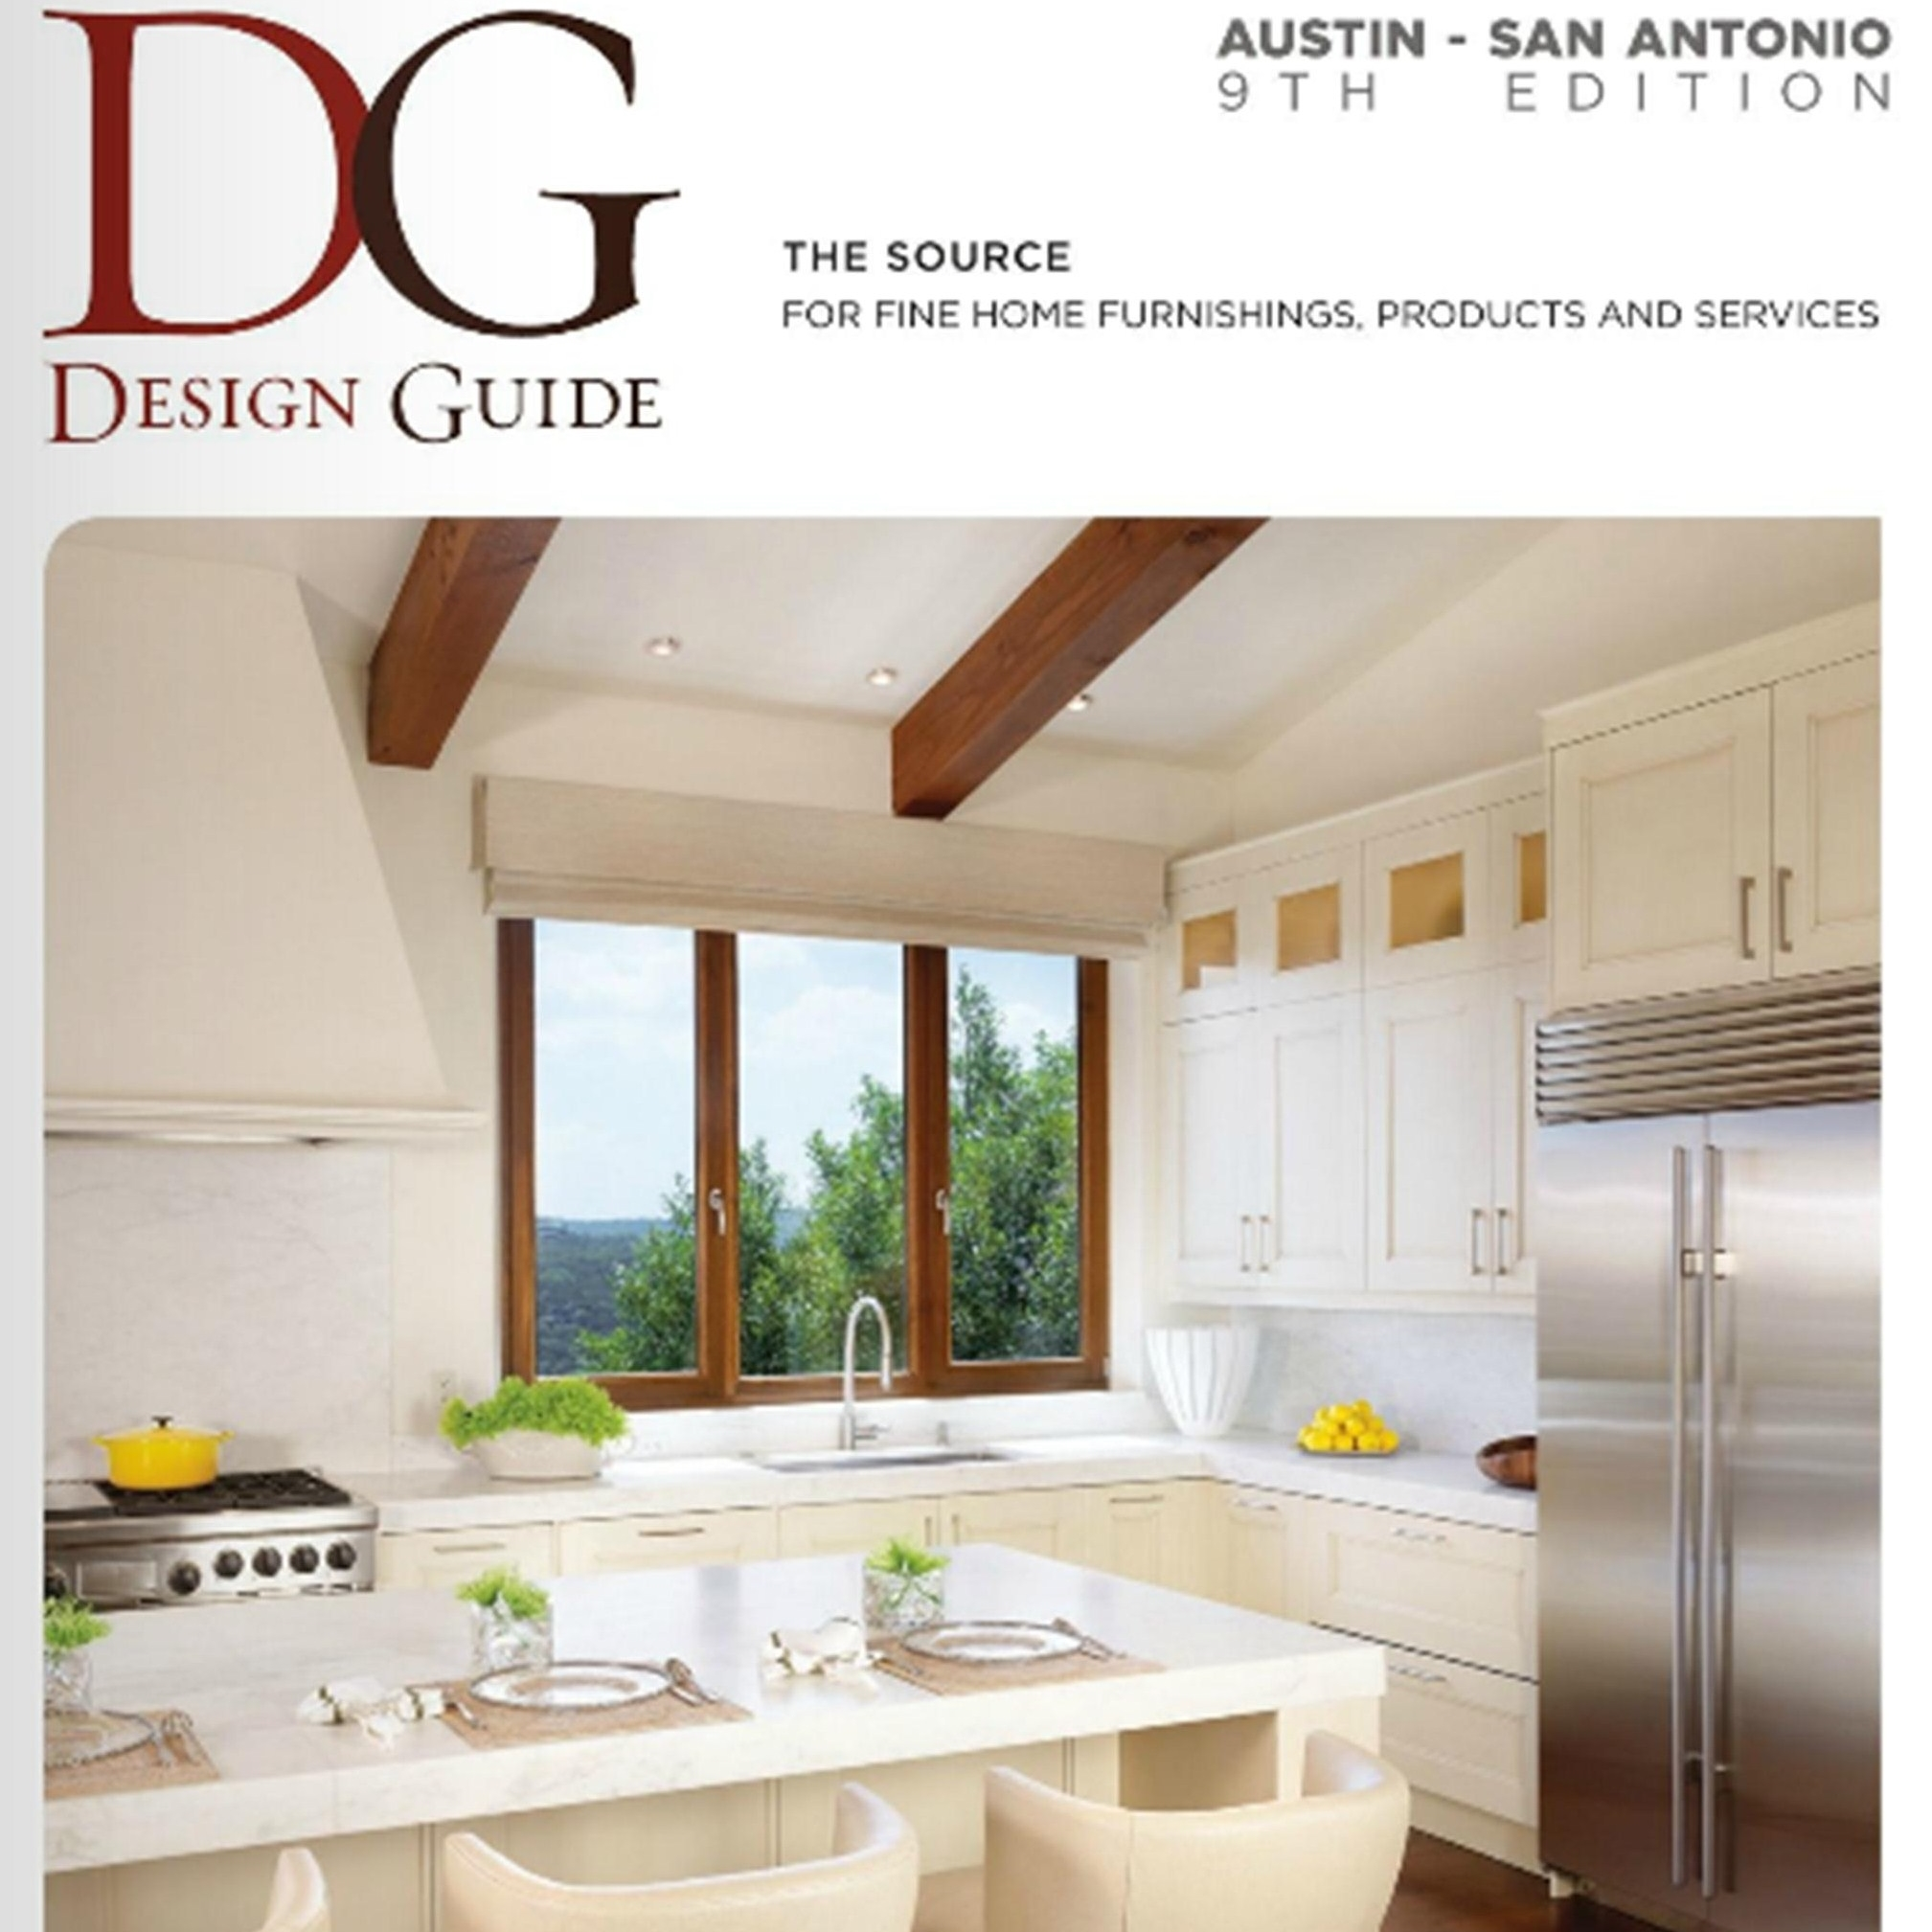 Design Guide 9th Edition 2011.jpg